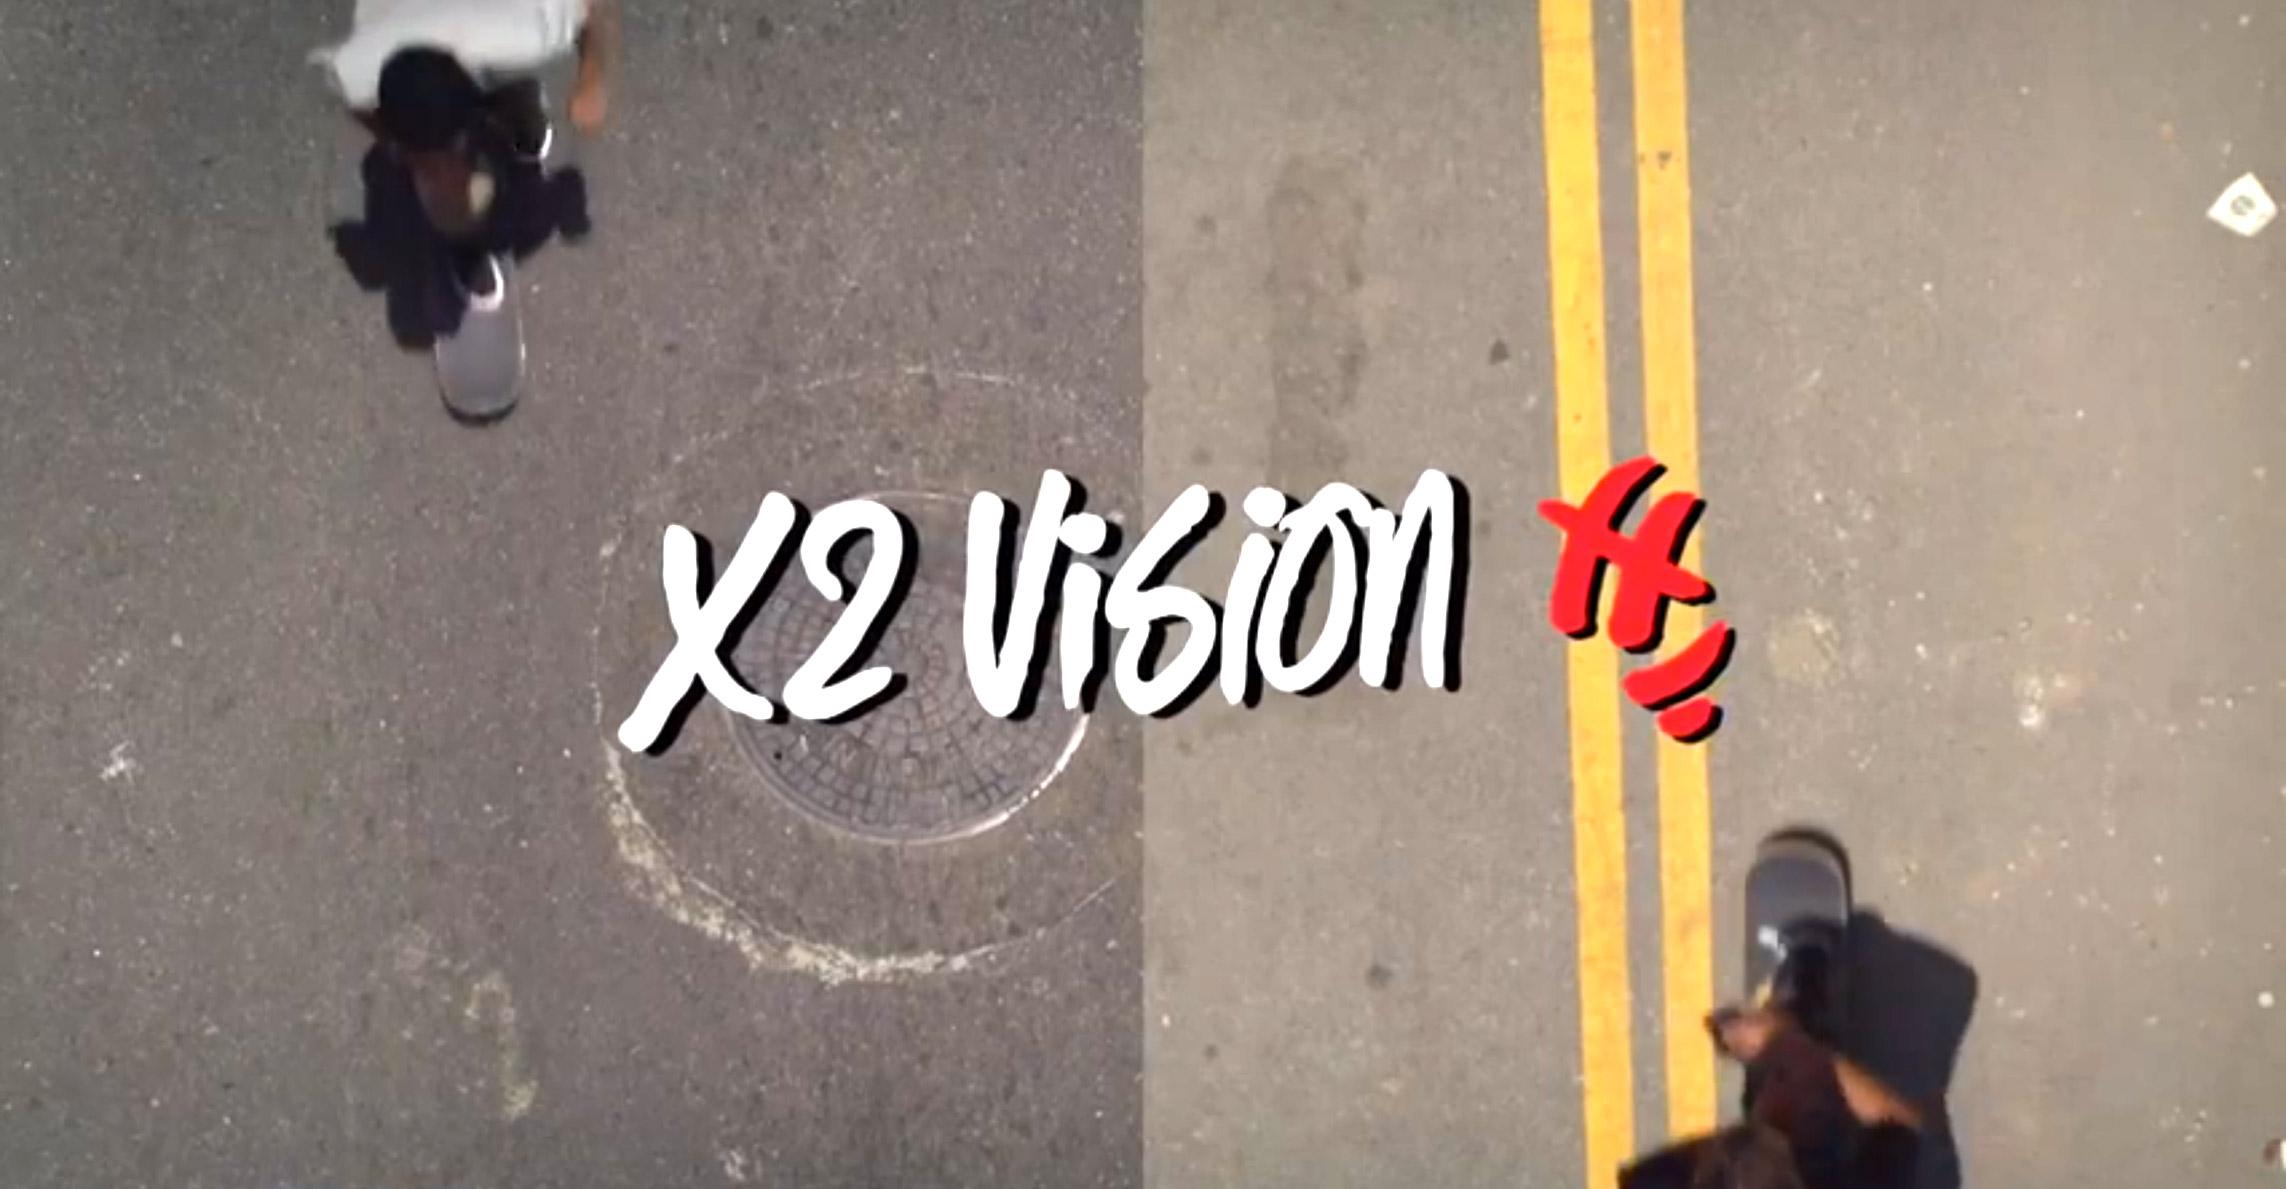 Blind X2 VISION_video trailer.